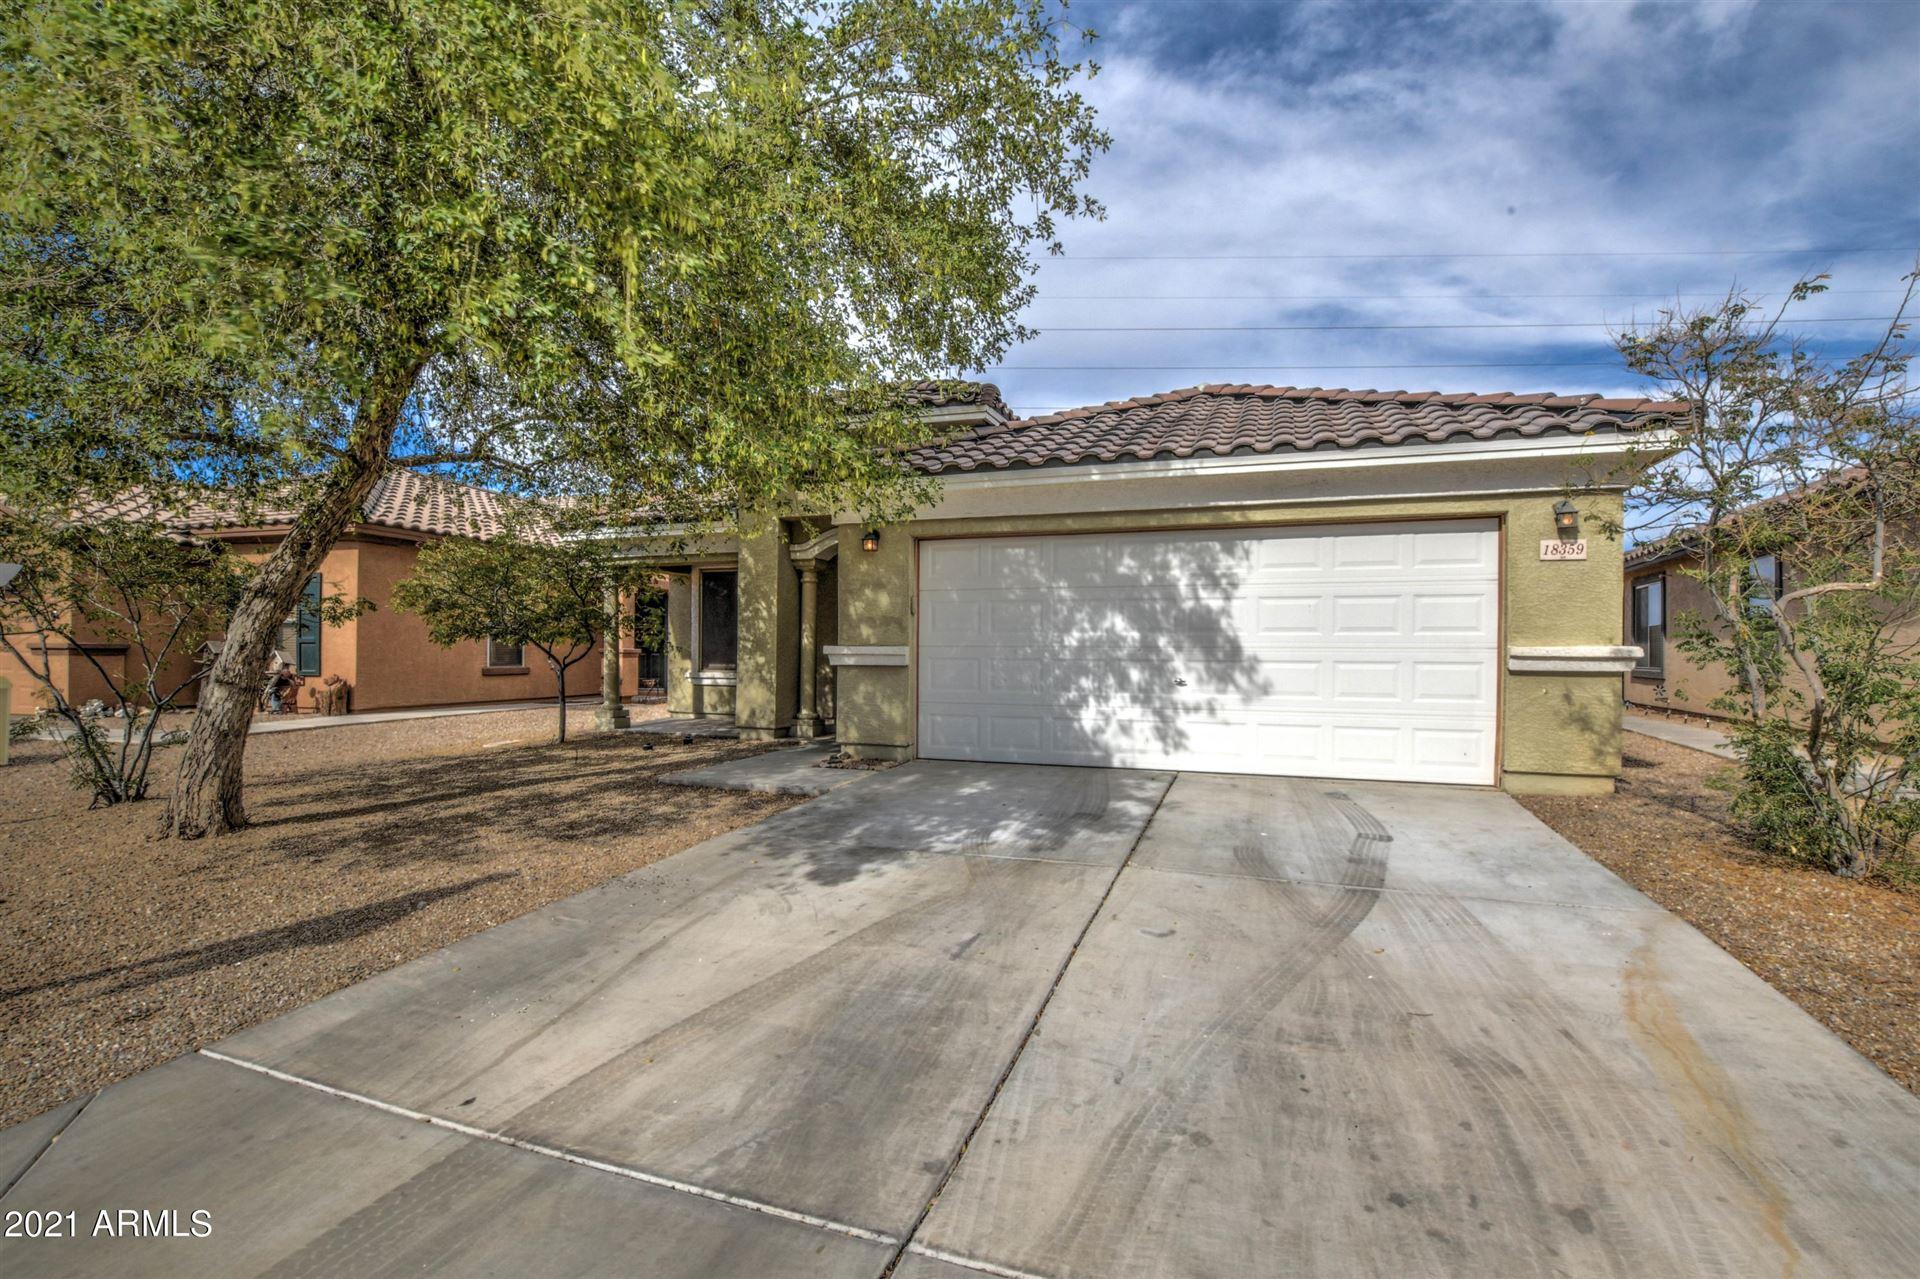 Photo of 18359 N CELIS Street, Maricopa, AZ 85138 (MLS # 6248411)